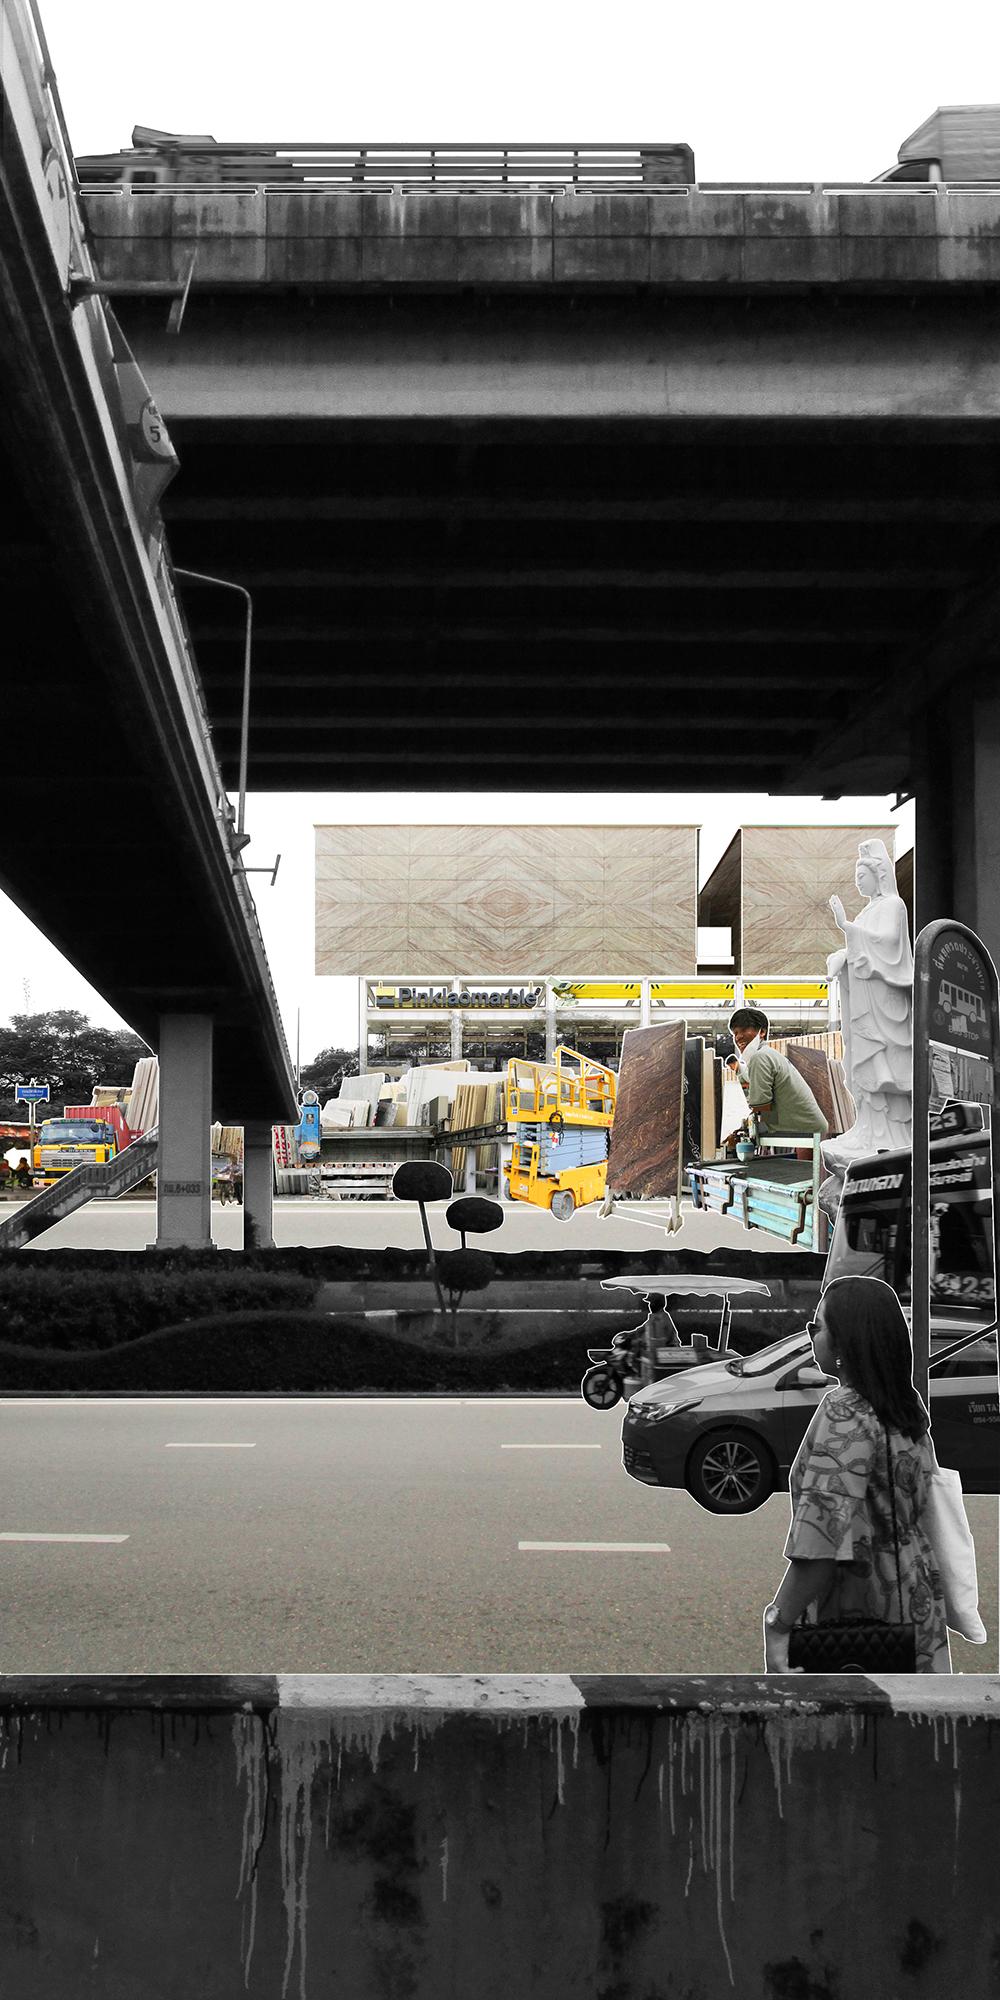 Pinklao Marble and Granite Headquarters - Location: Bangkok, ThailandClient: Watchara PruksananontYear: 2015-2018Status: ConstructionProgram: Showroom, Office, Residential / 600m²Role: ArchitectPhotographer: Ketsiree Wongwan